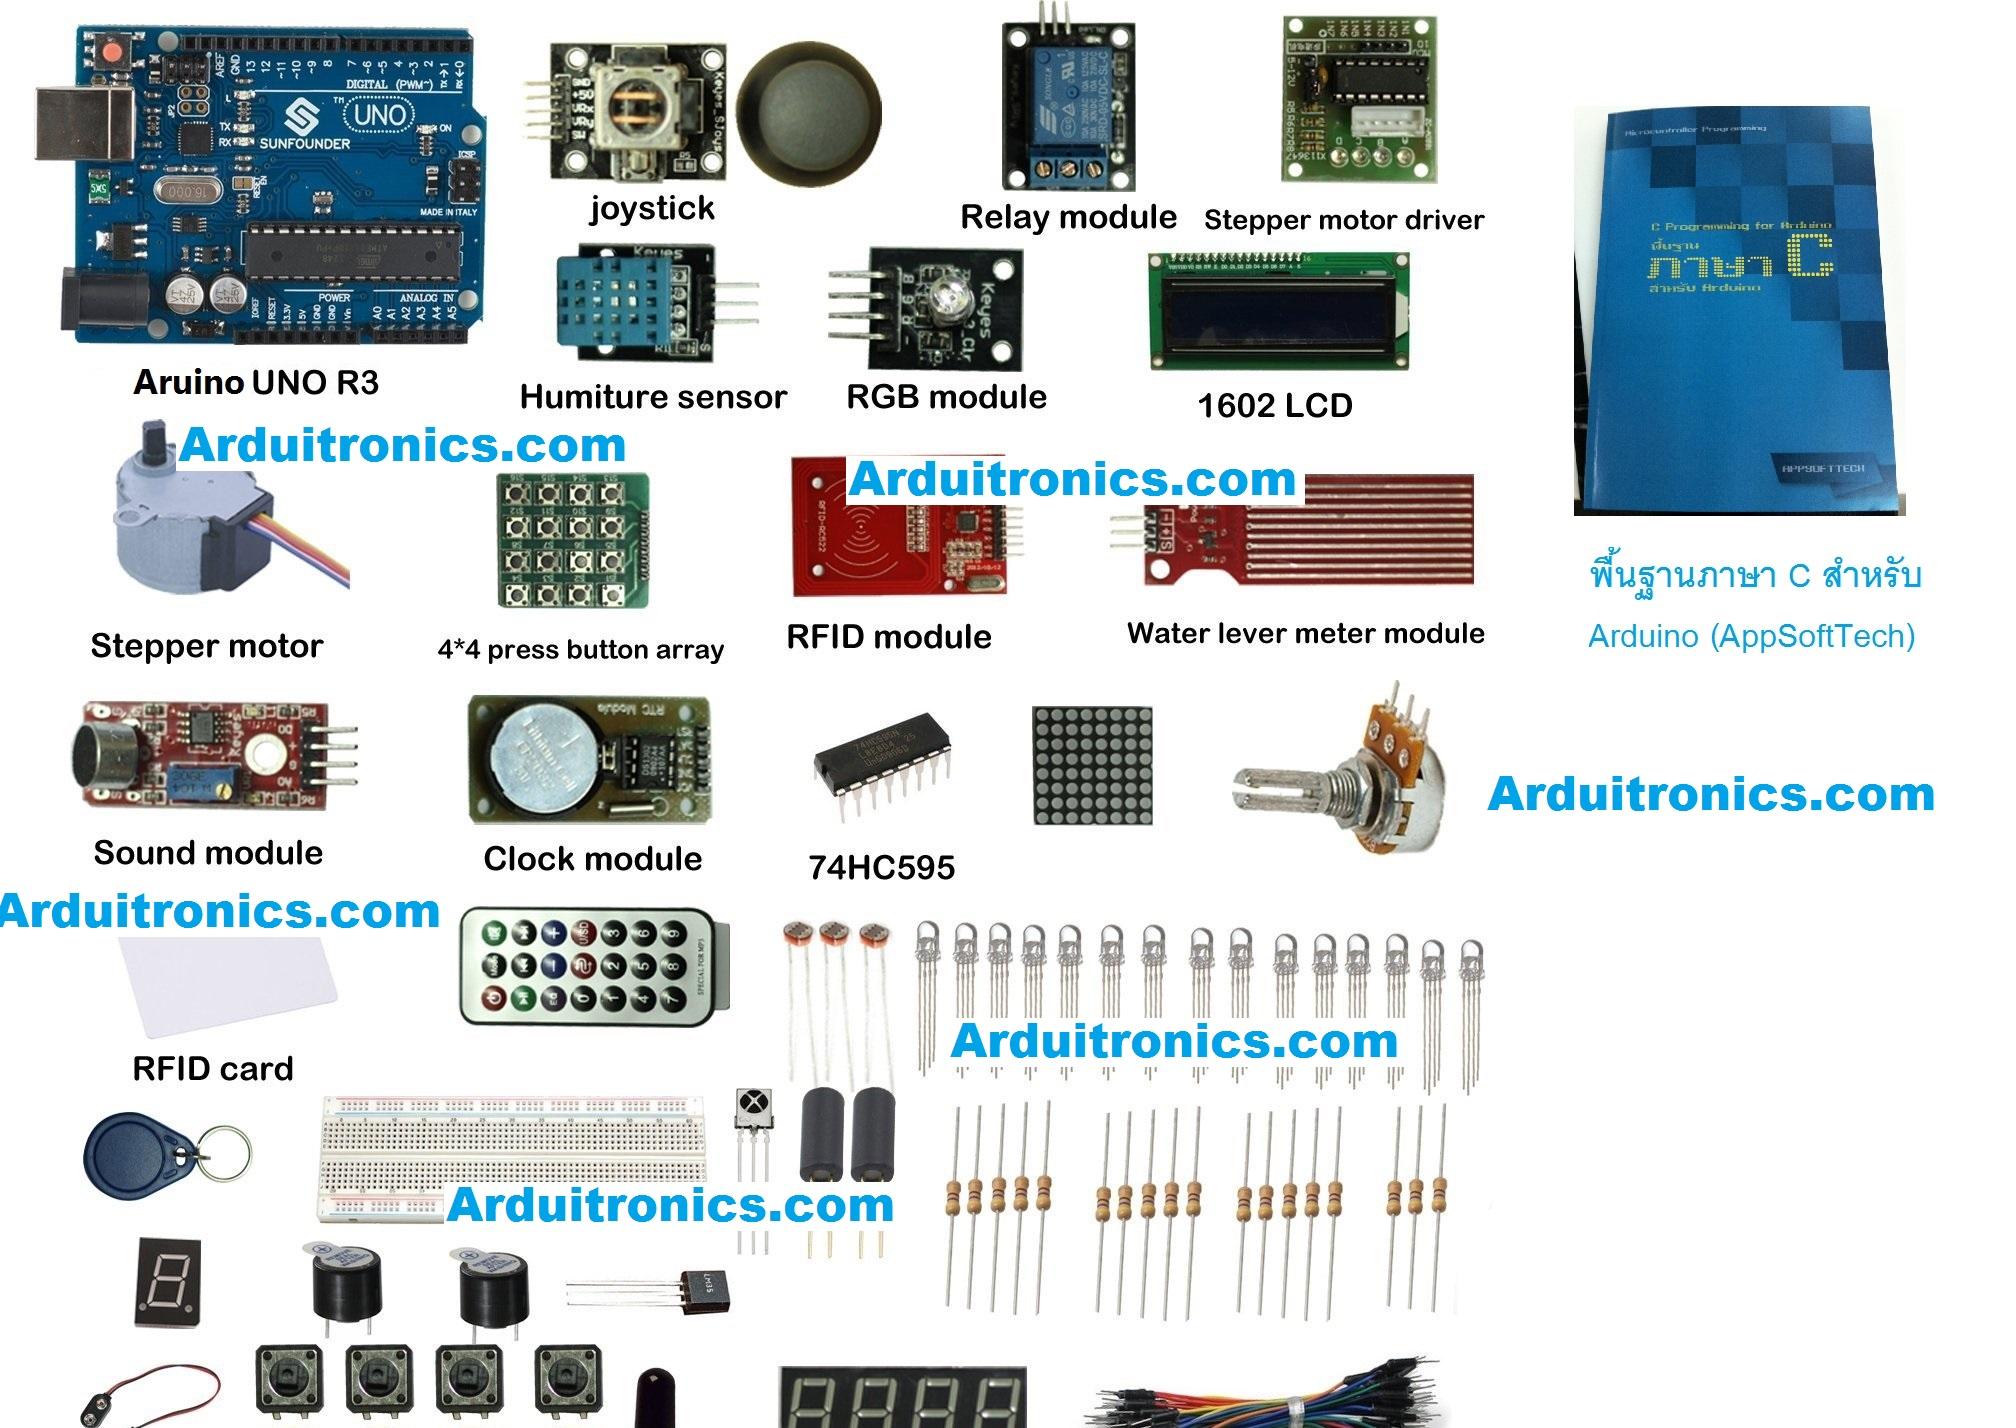 Extreme RFID Learning Kit for Arduino + หนังสือพื้นฐานภาษา C สำหรับ Arduino (AppSoftTech)